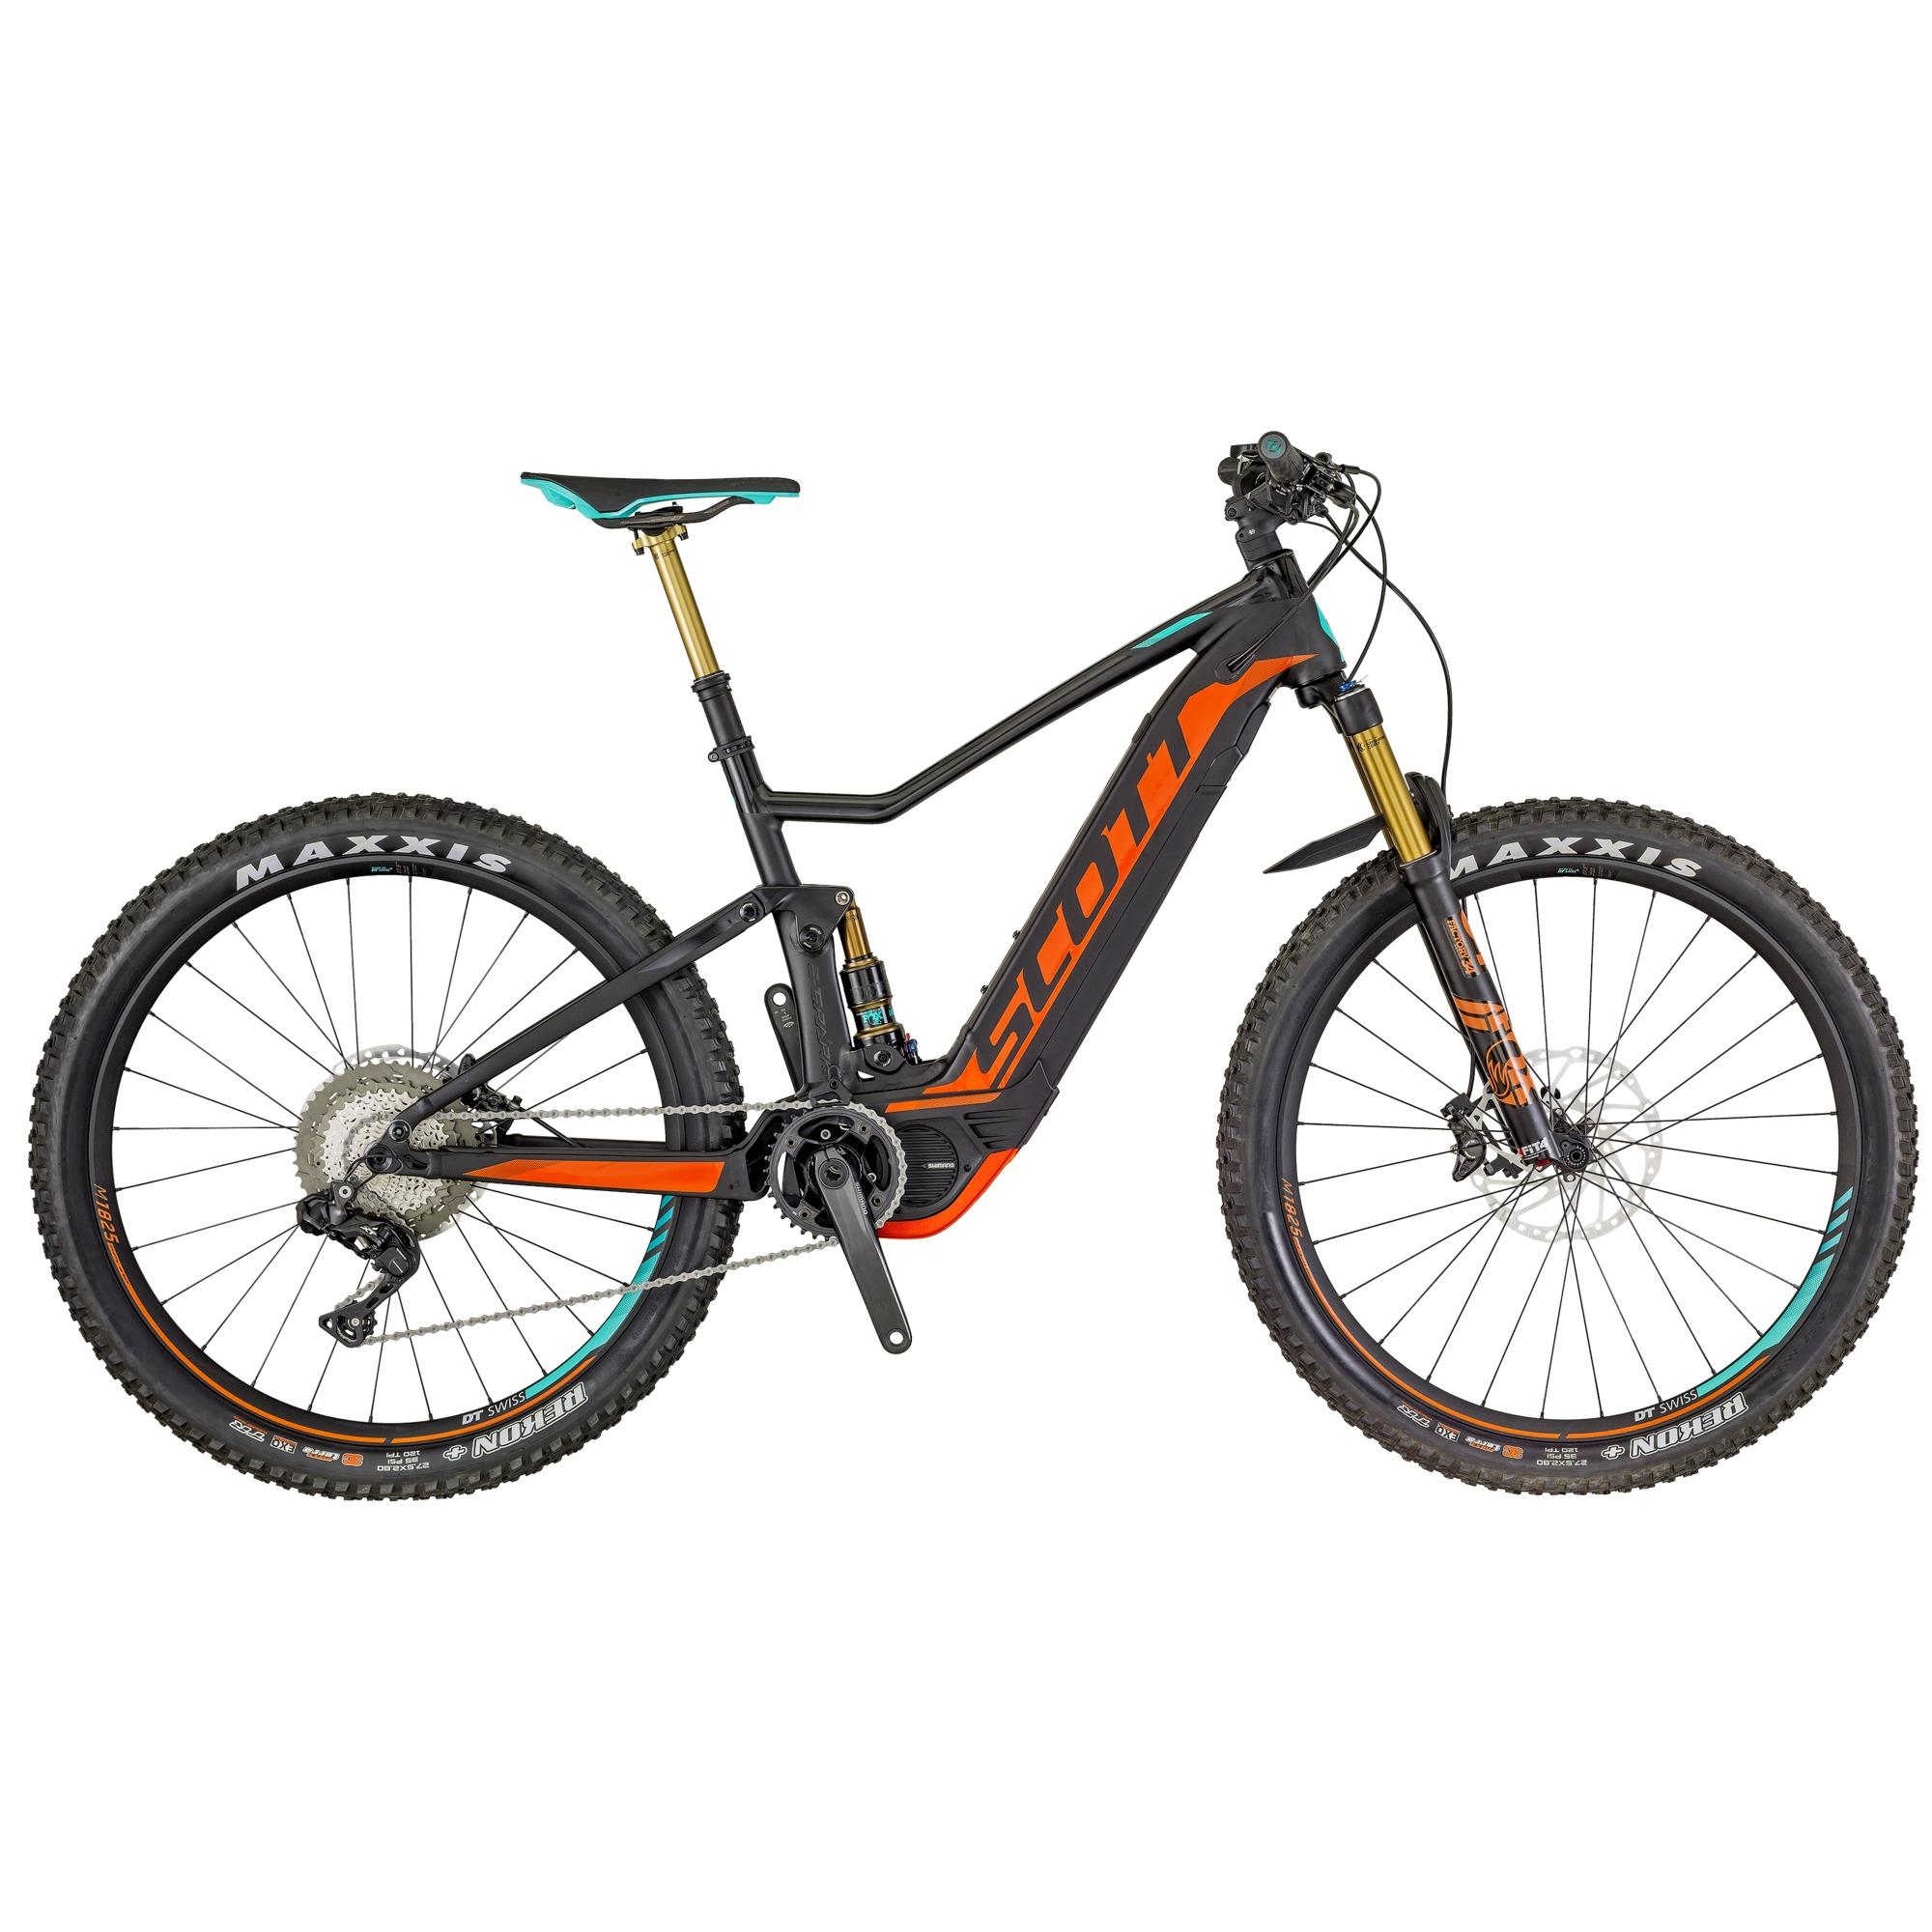 SCOTT E-Spark 700 Tuned Bike L - Zweirad Homann